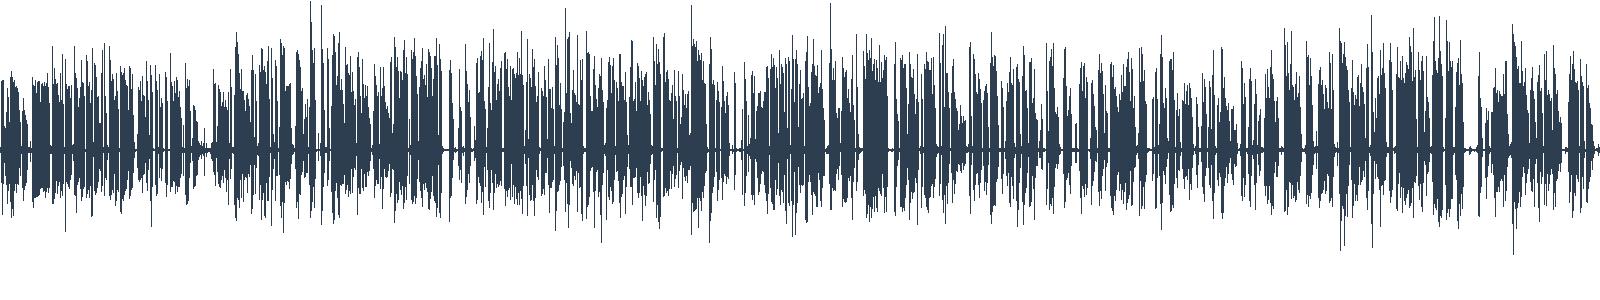 Svätej Matky Terezy z Kalkaty waveform